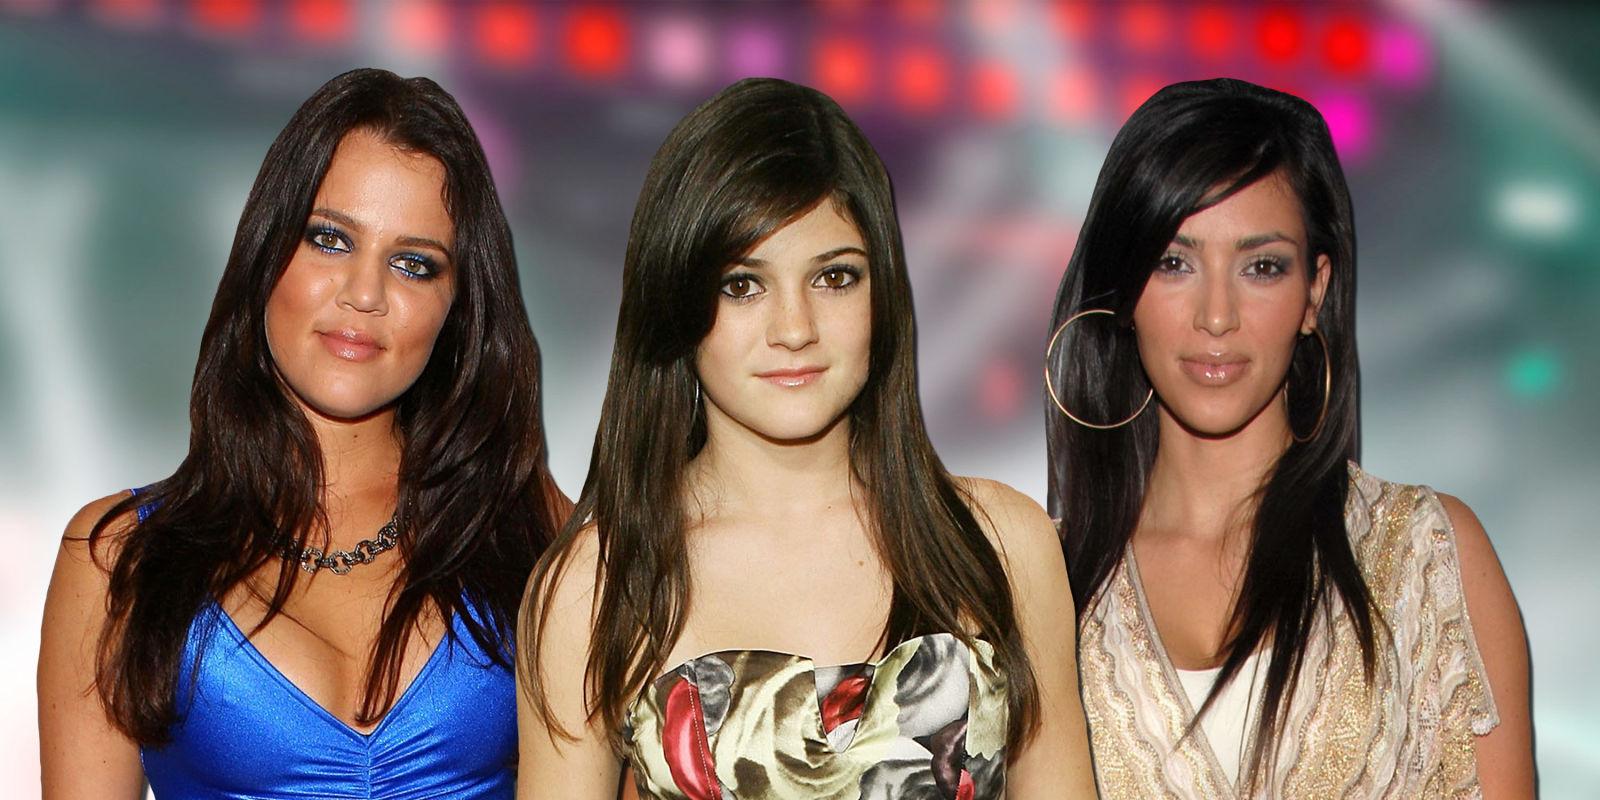 Kim kardashian before surgery celebrity